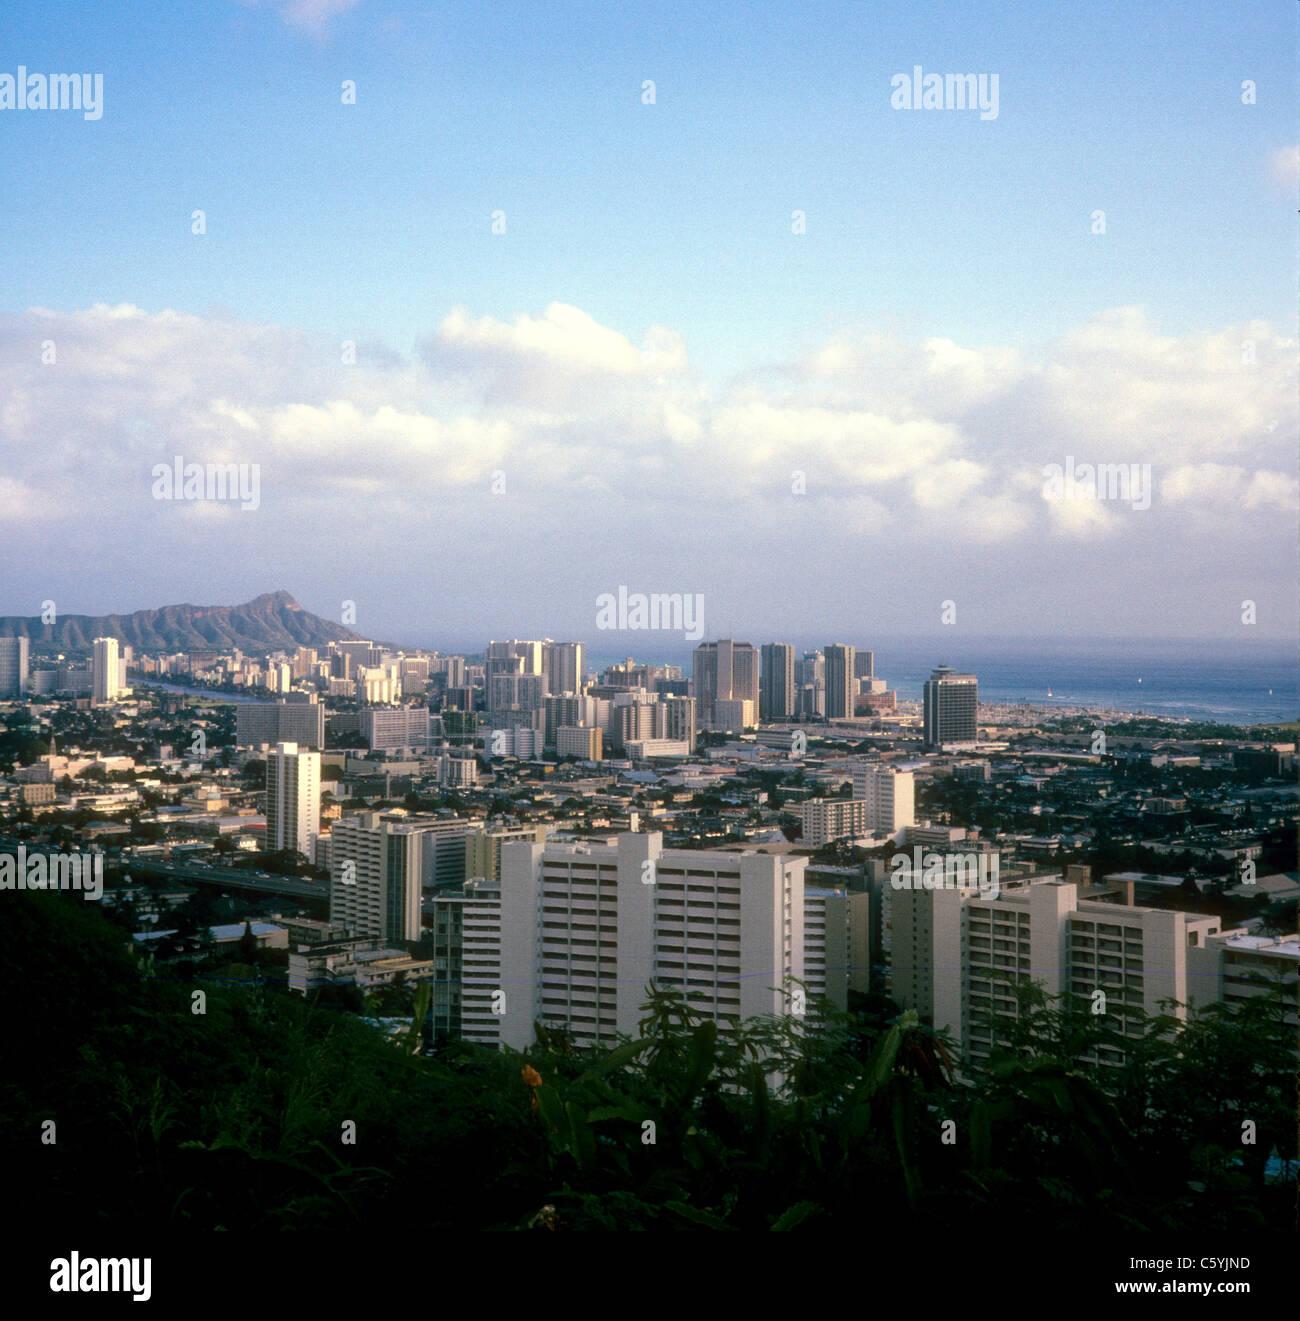 Honolulu Hawaii city scape 1974 city tourist destination urban - Stock Image